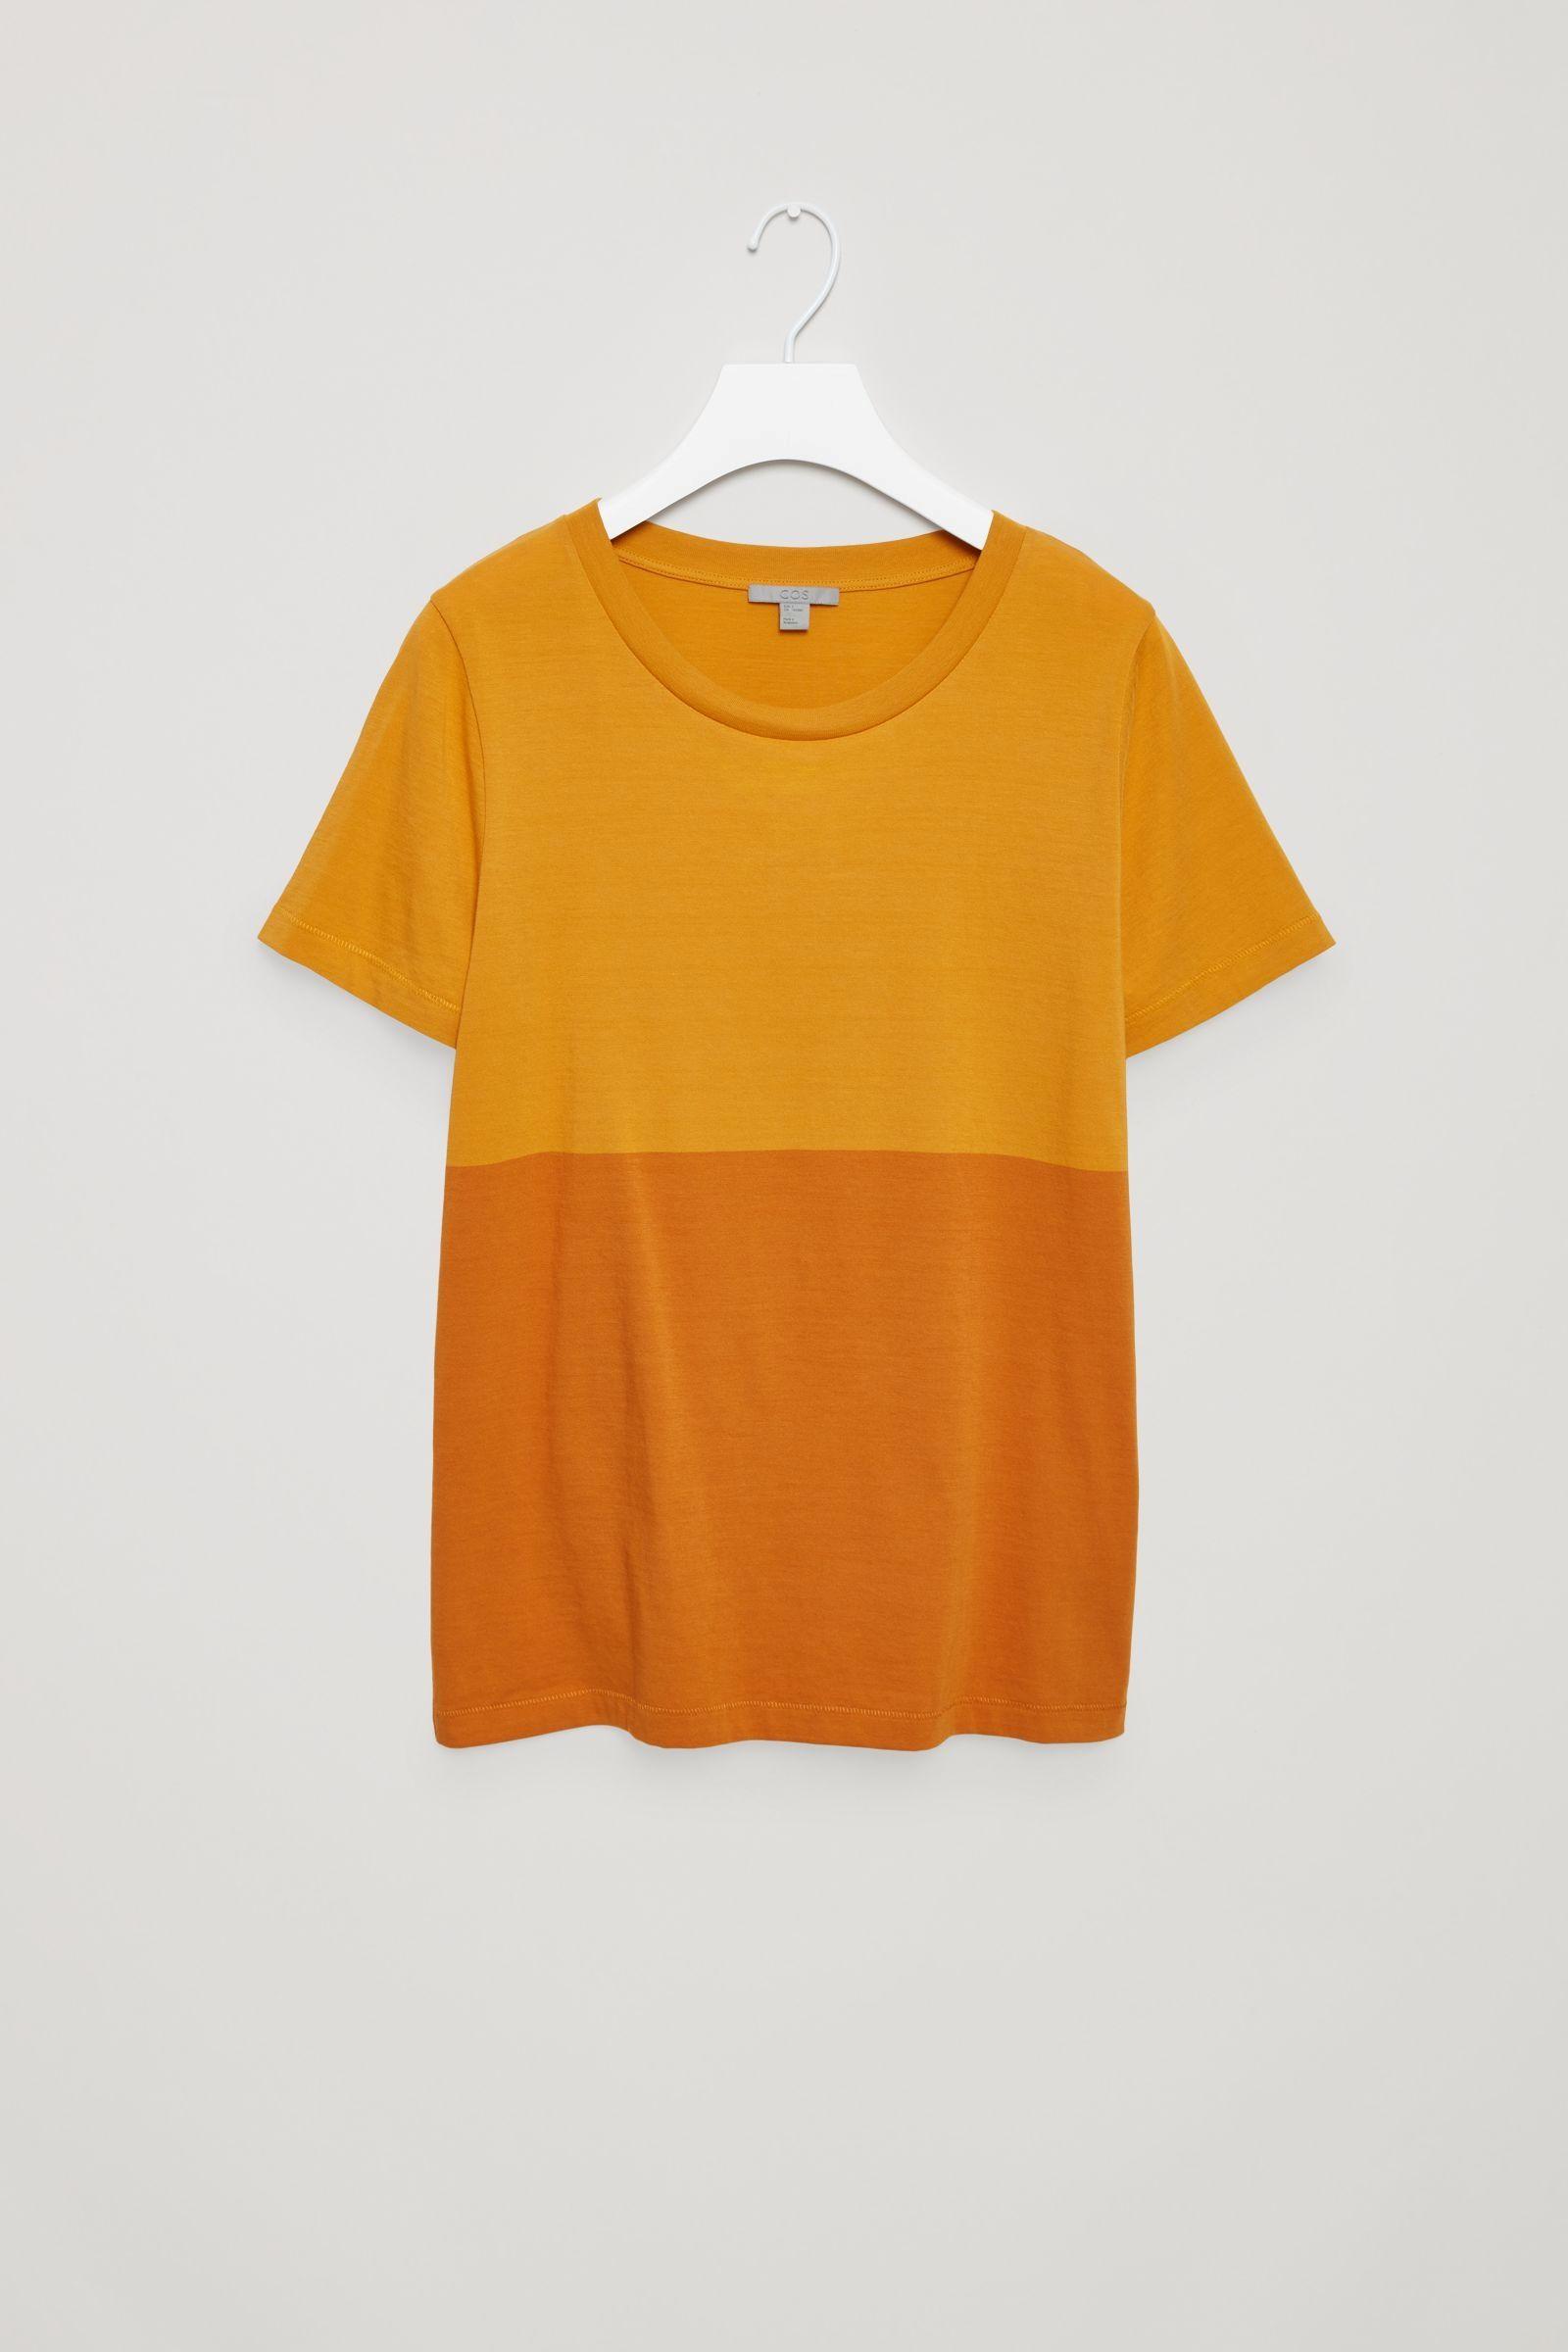 d7c1c91994 Colour-block cotton t-shirt - Mustard - New - COS GB in 2019 | t ...